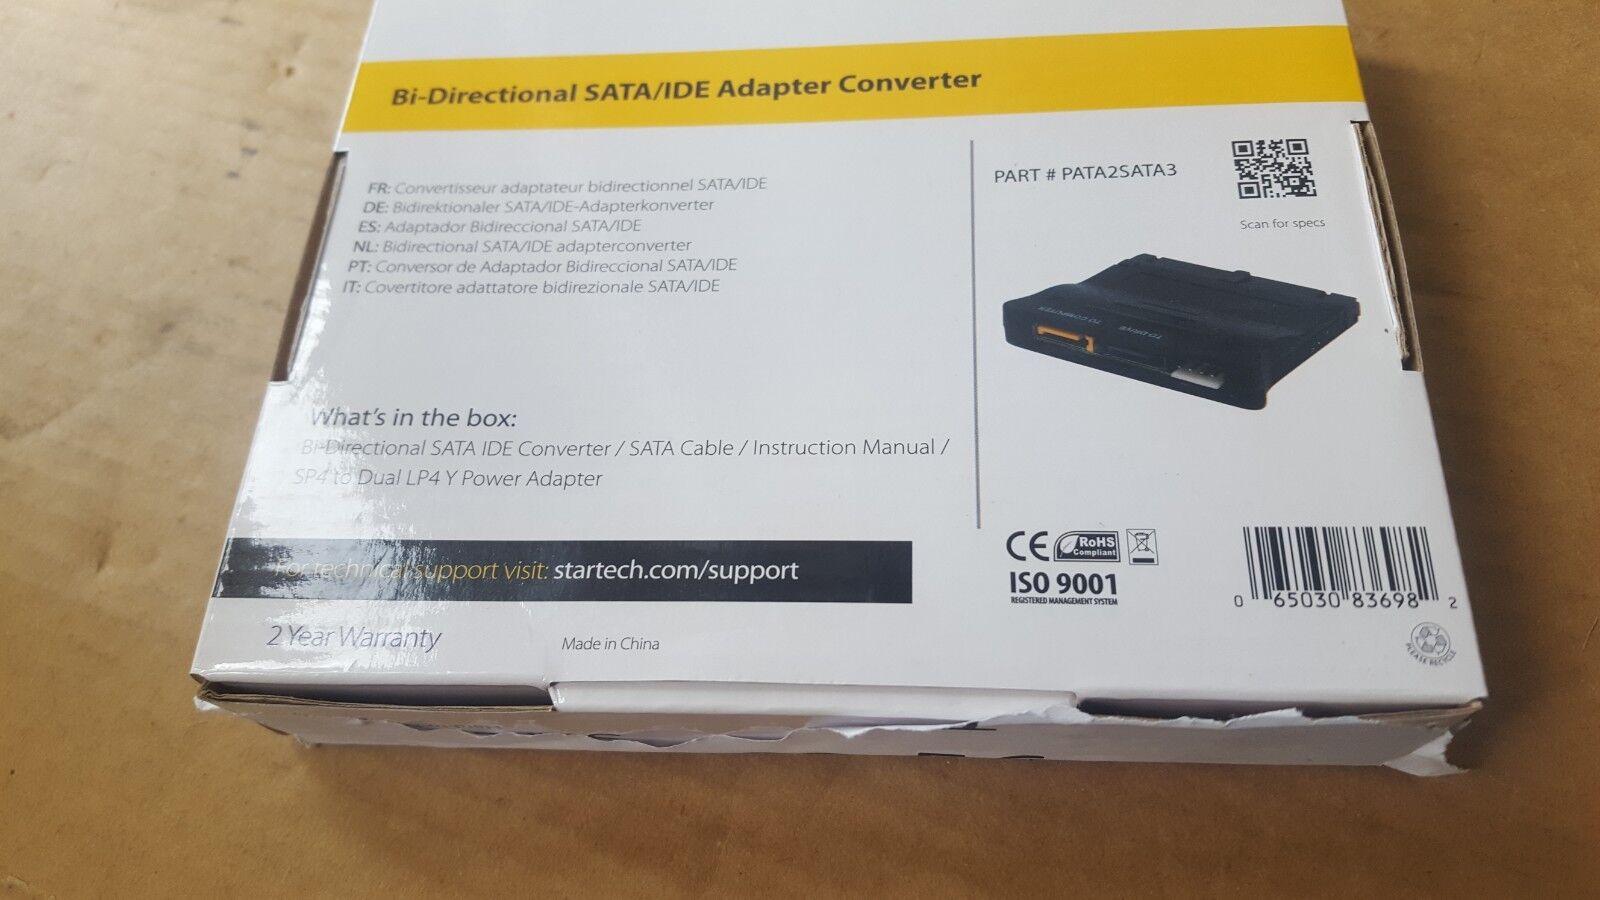 STARTECH PATA2SATA3 SATA IDE Adaptor Converter (BR1.6B5)